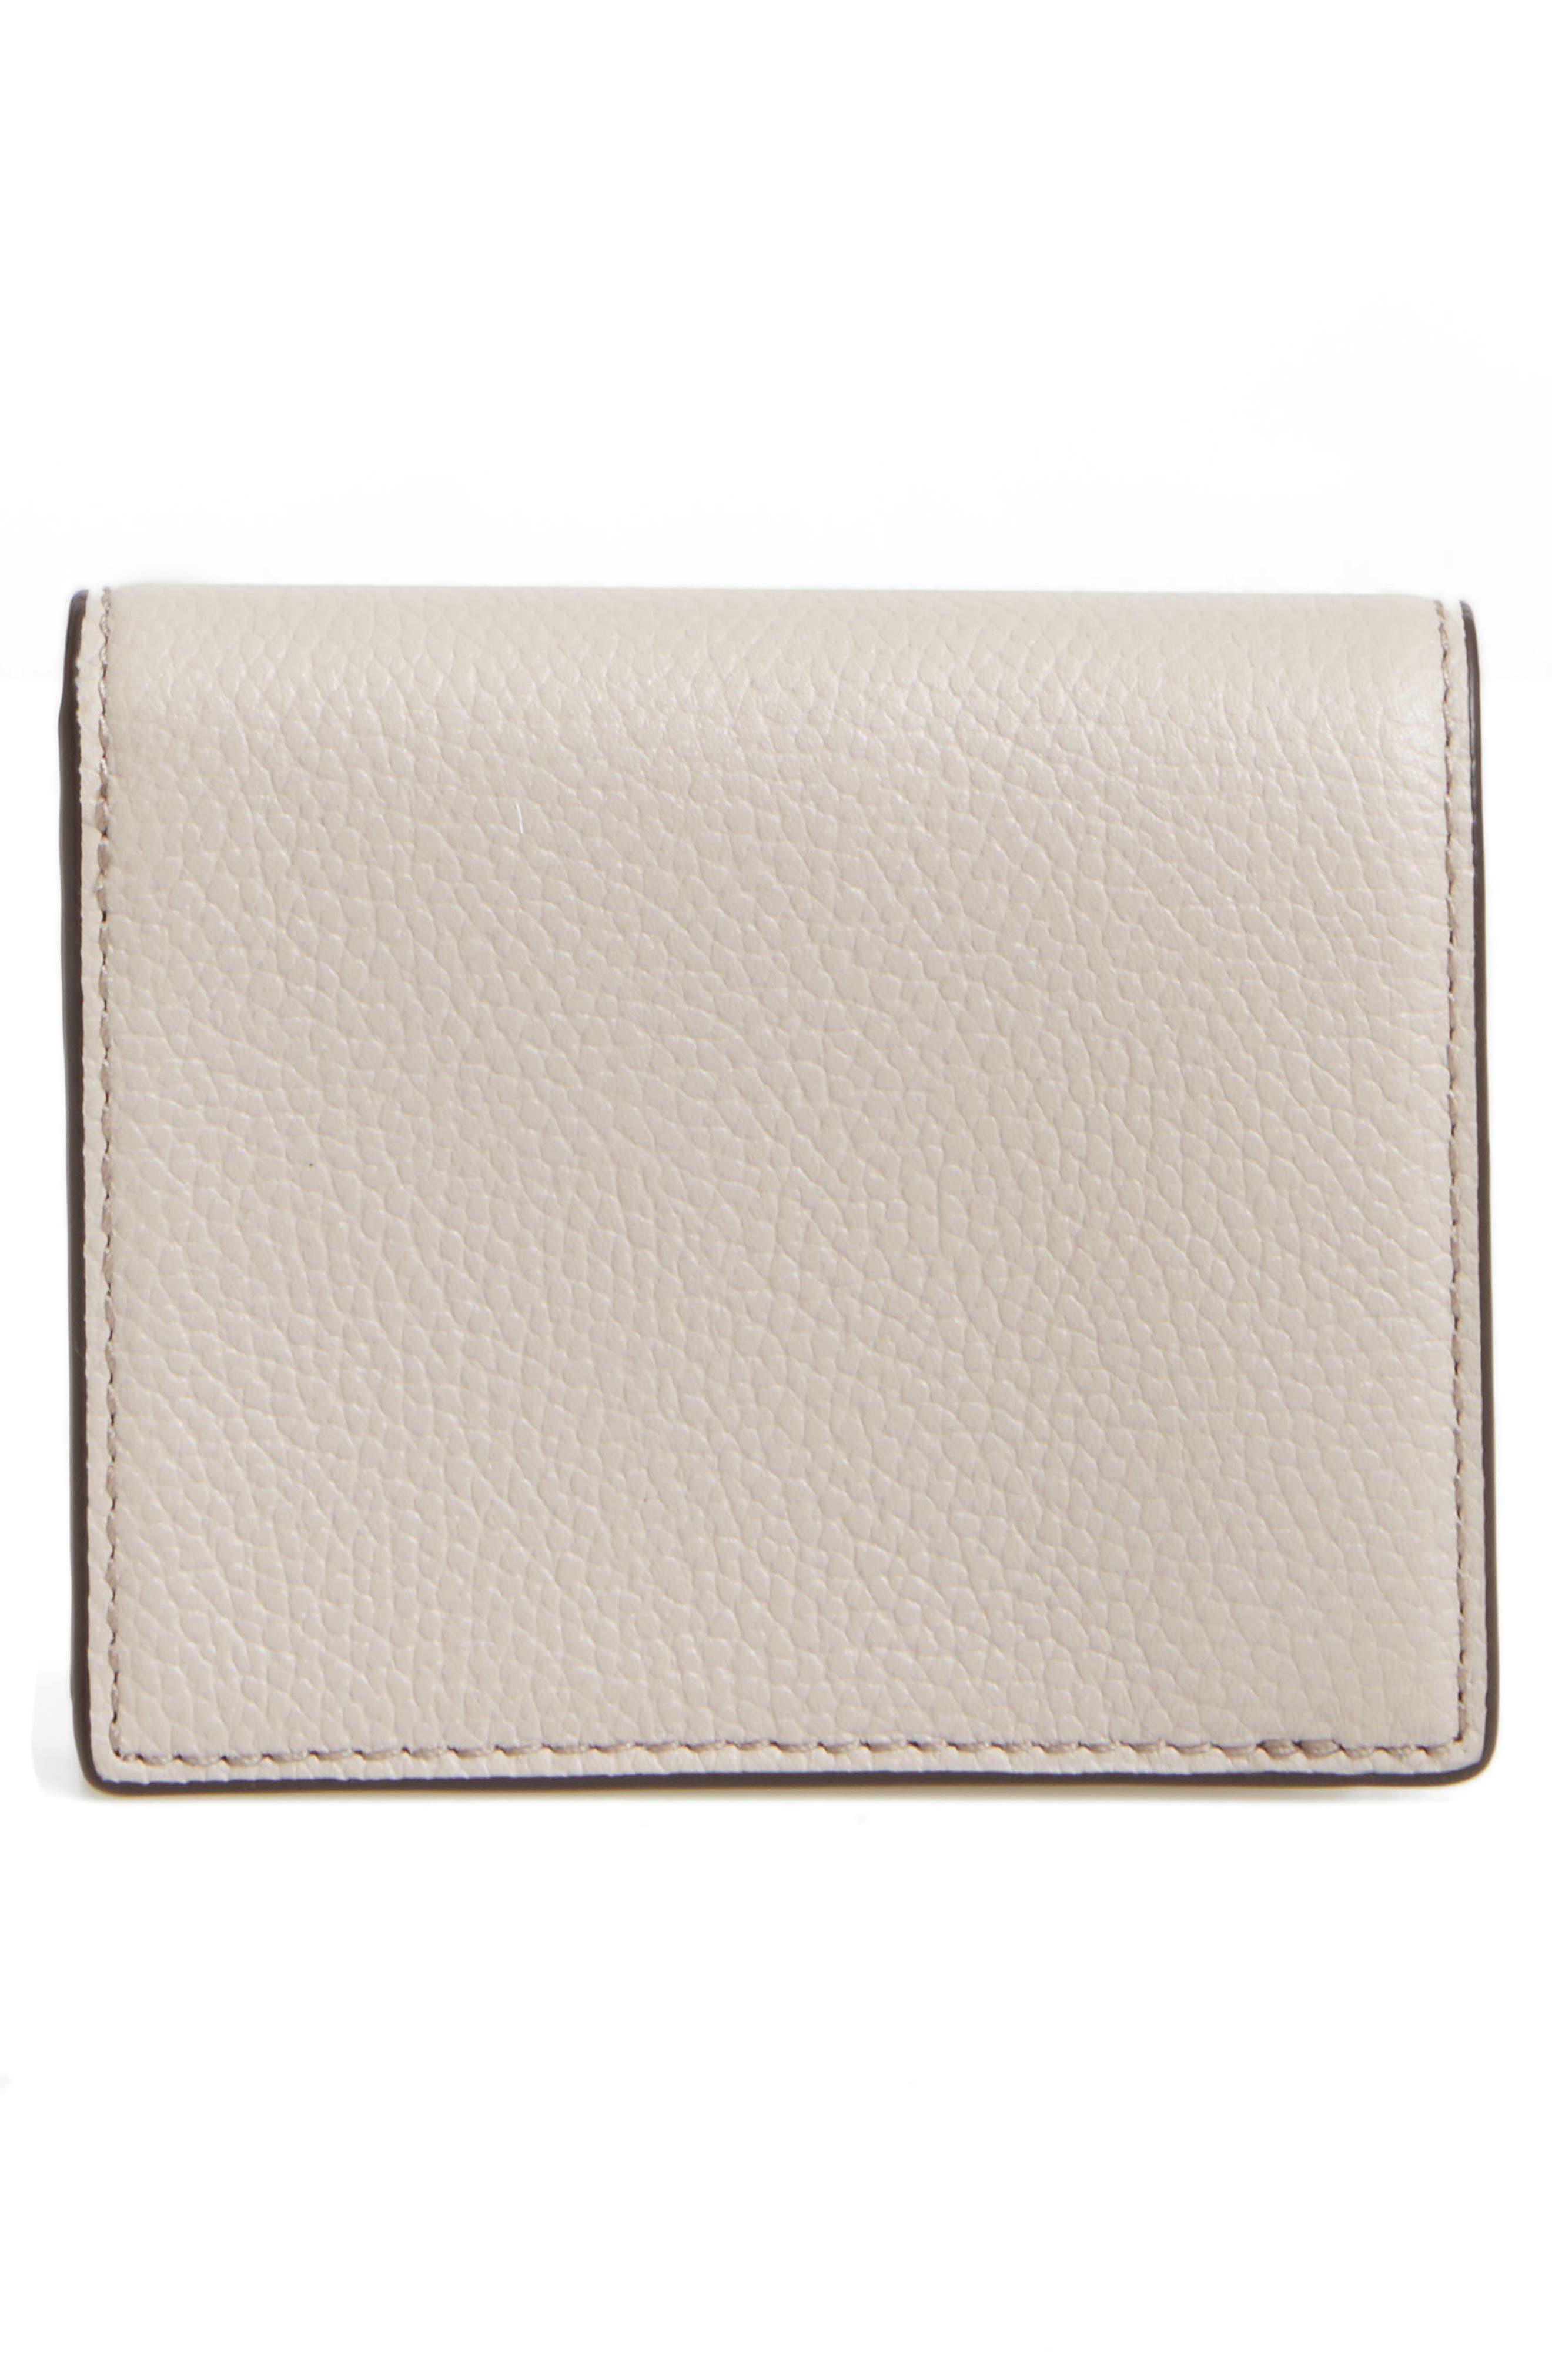 Mercer Leather RFID Cardholder Wallet,                             Alternate thumbnail 4, color,                             292